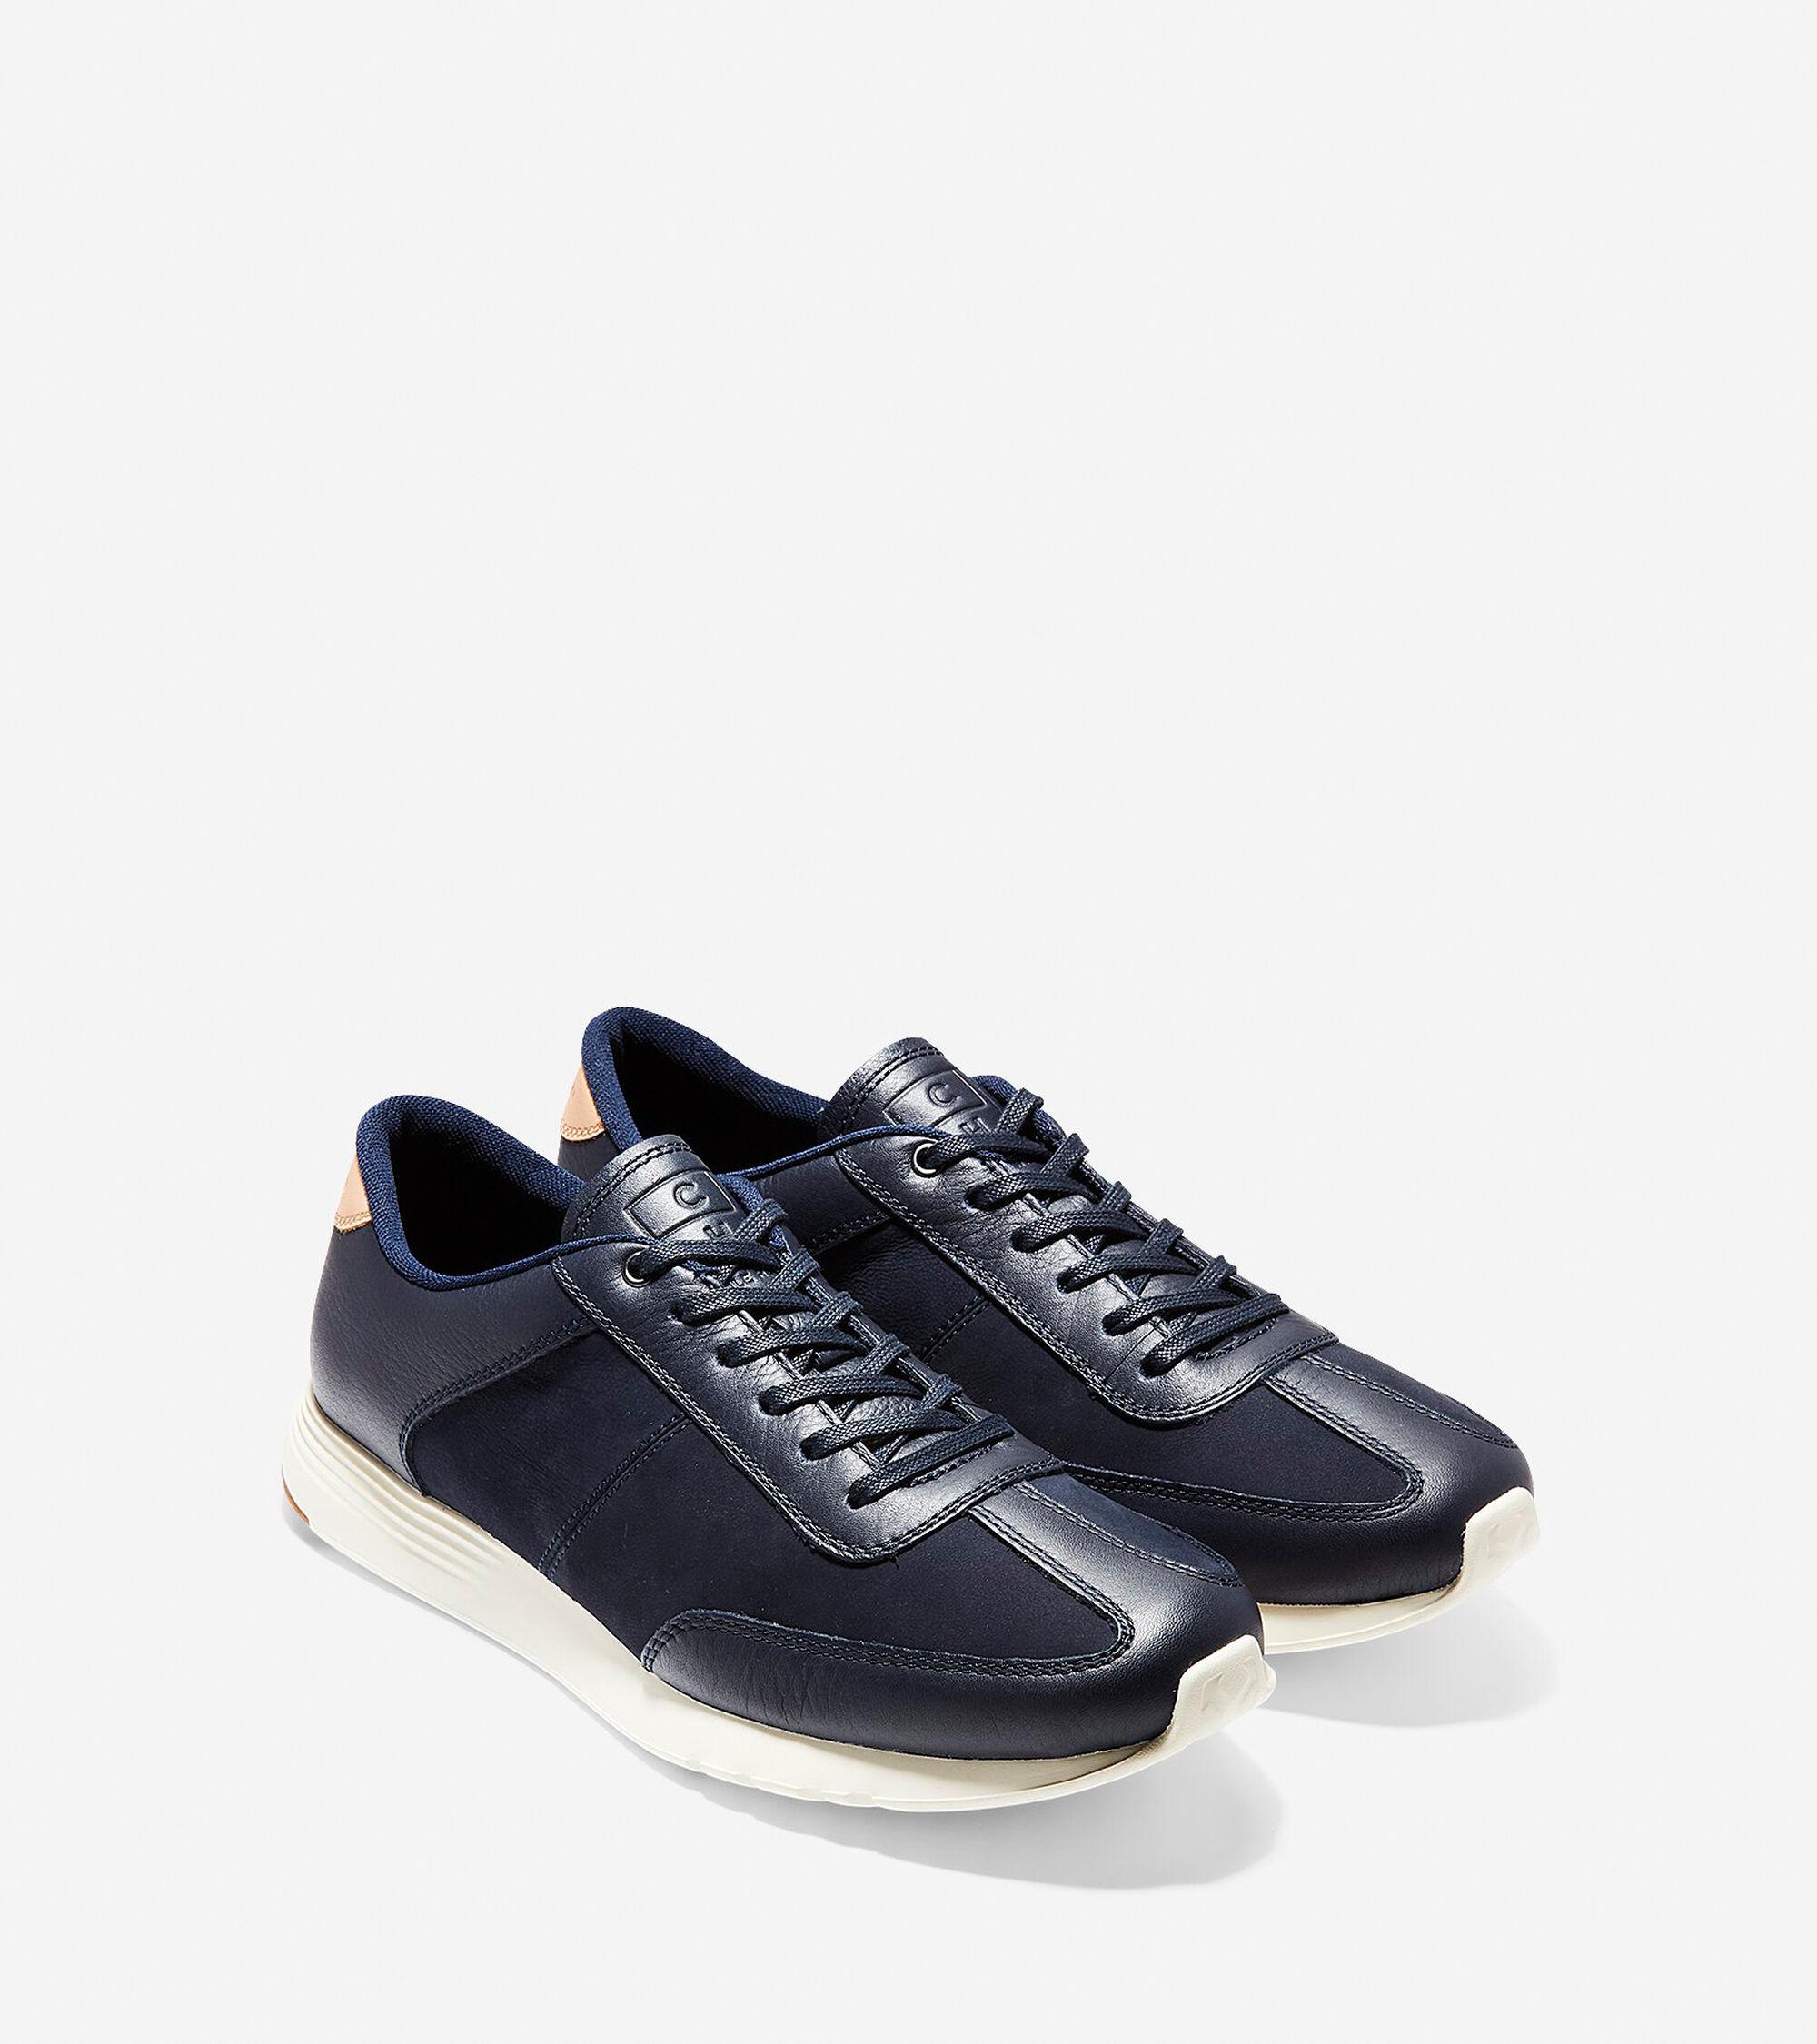 74ed4838ff5 Men s Grand Crosscourt Running Sneakers in Marine Blue